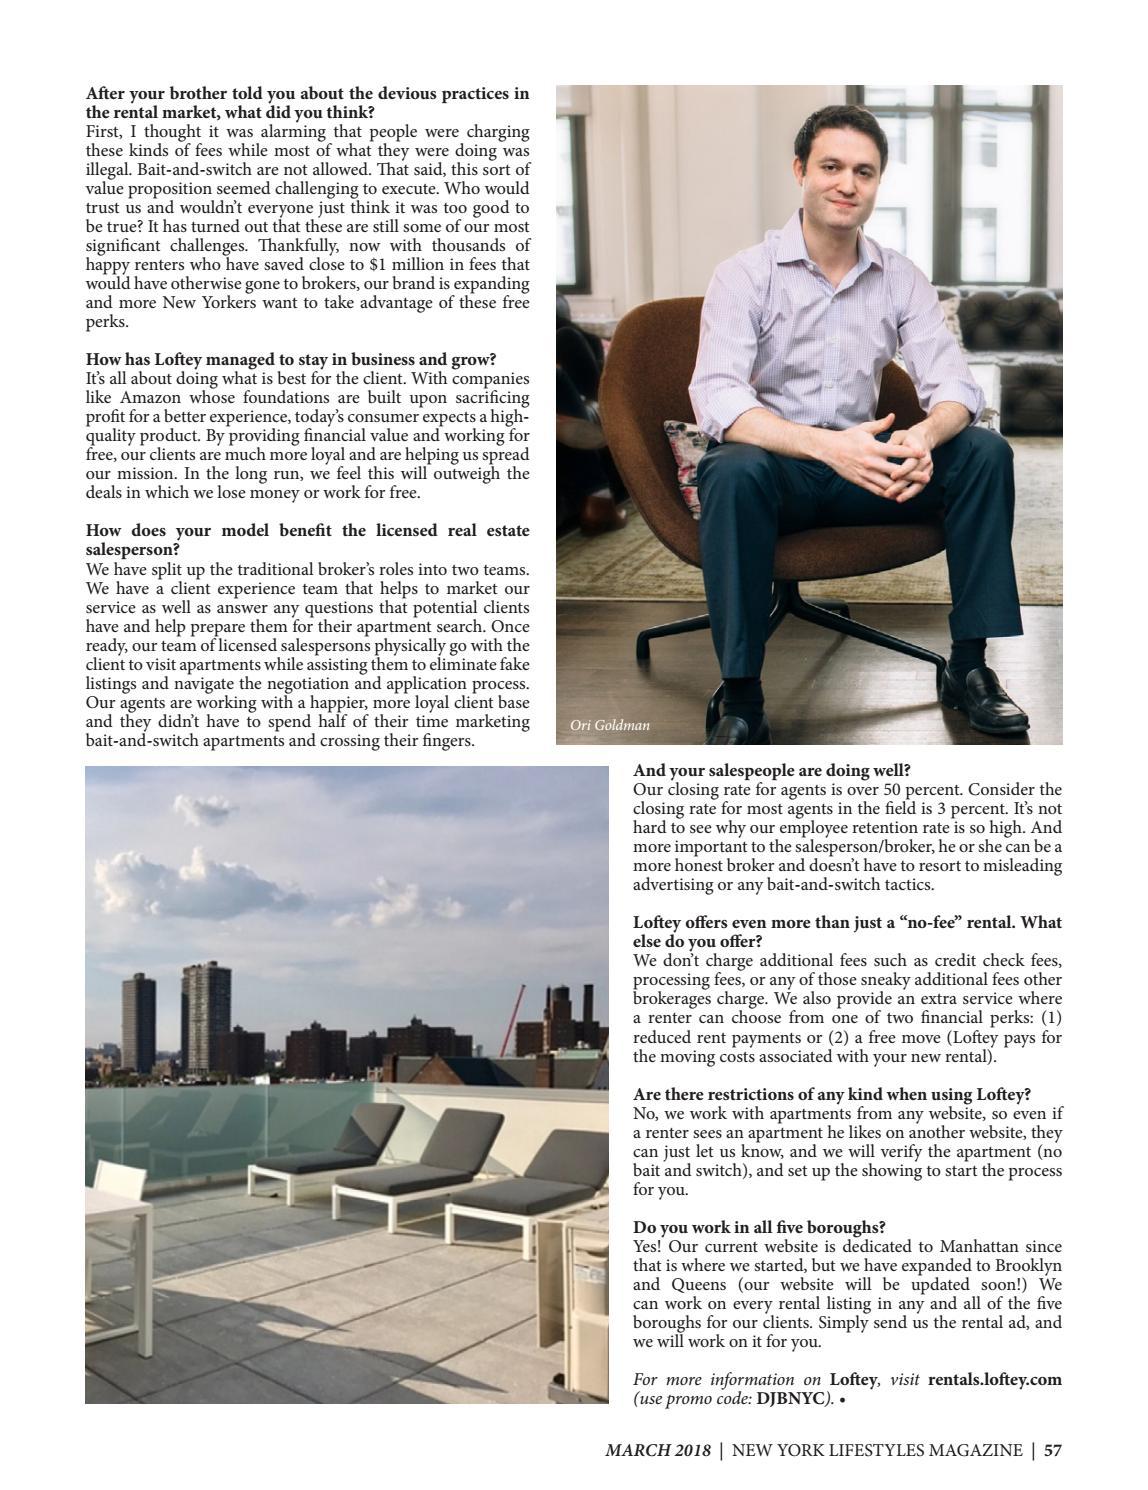 New York Lifestyles Magazine - March 2018 by New York Lifestyles